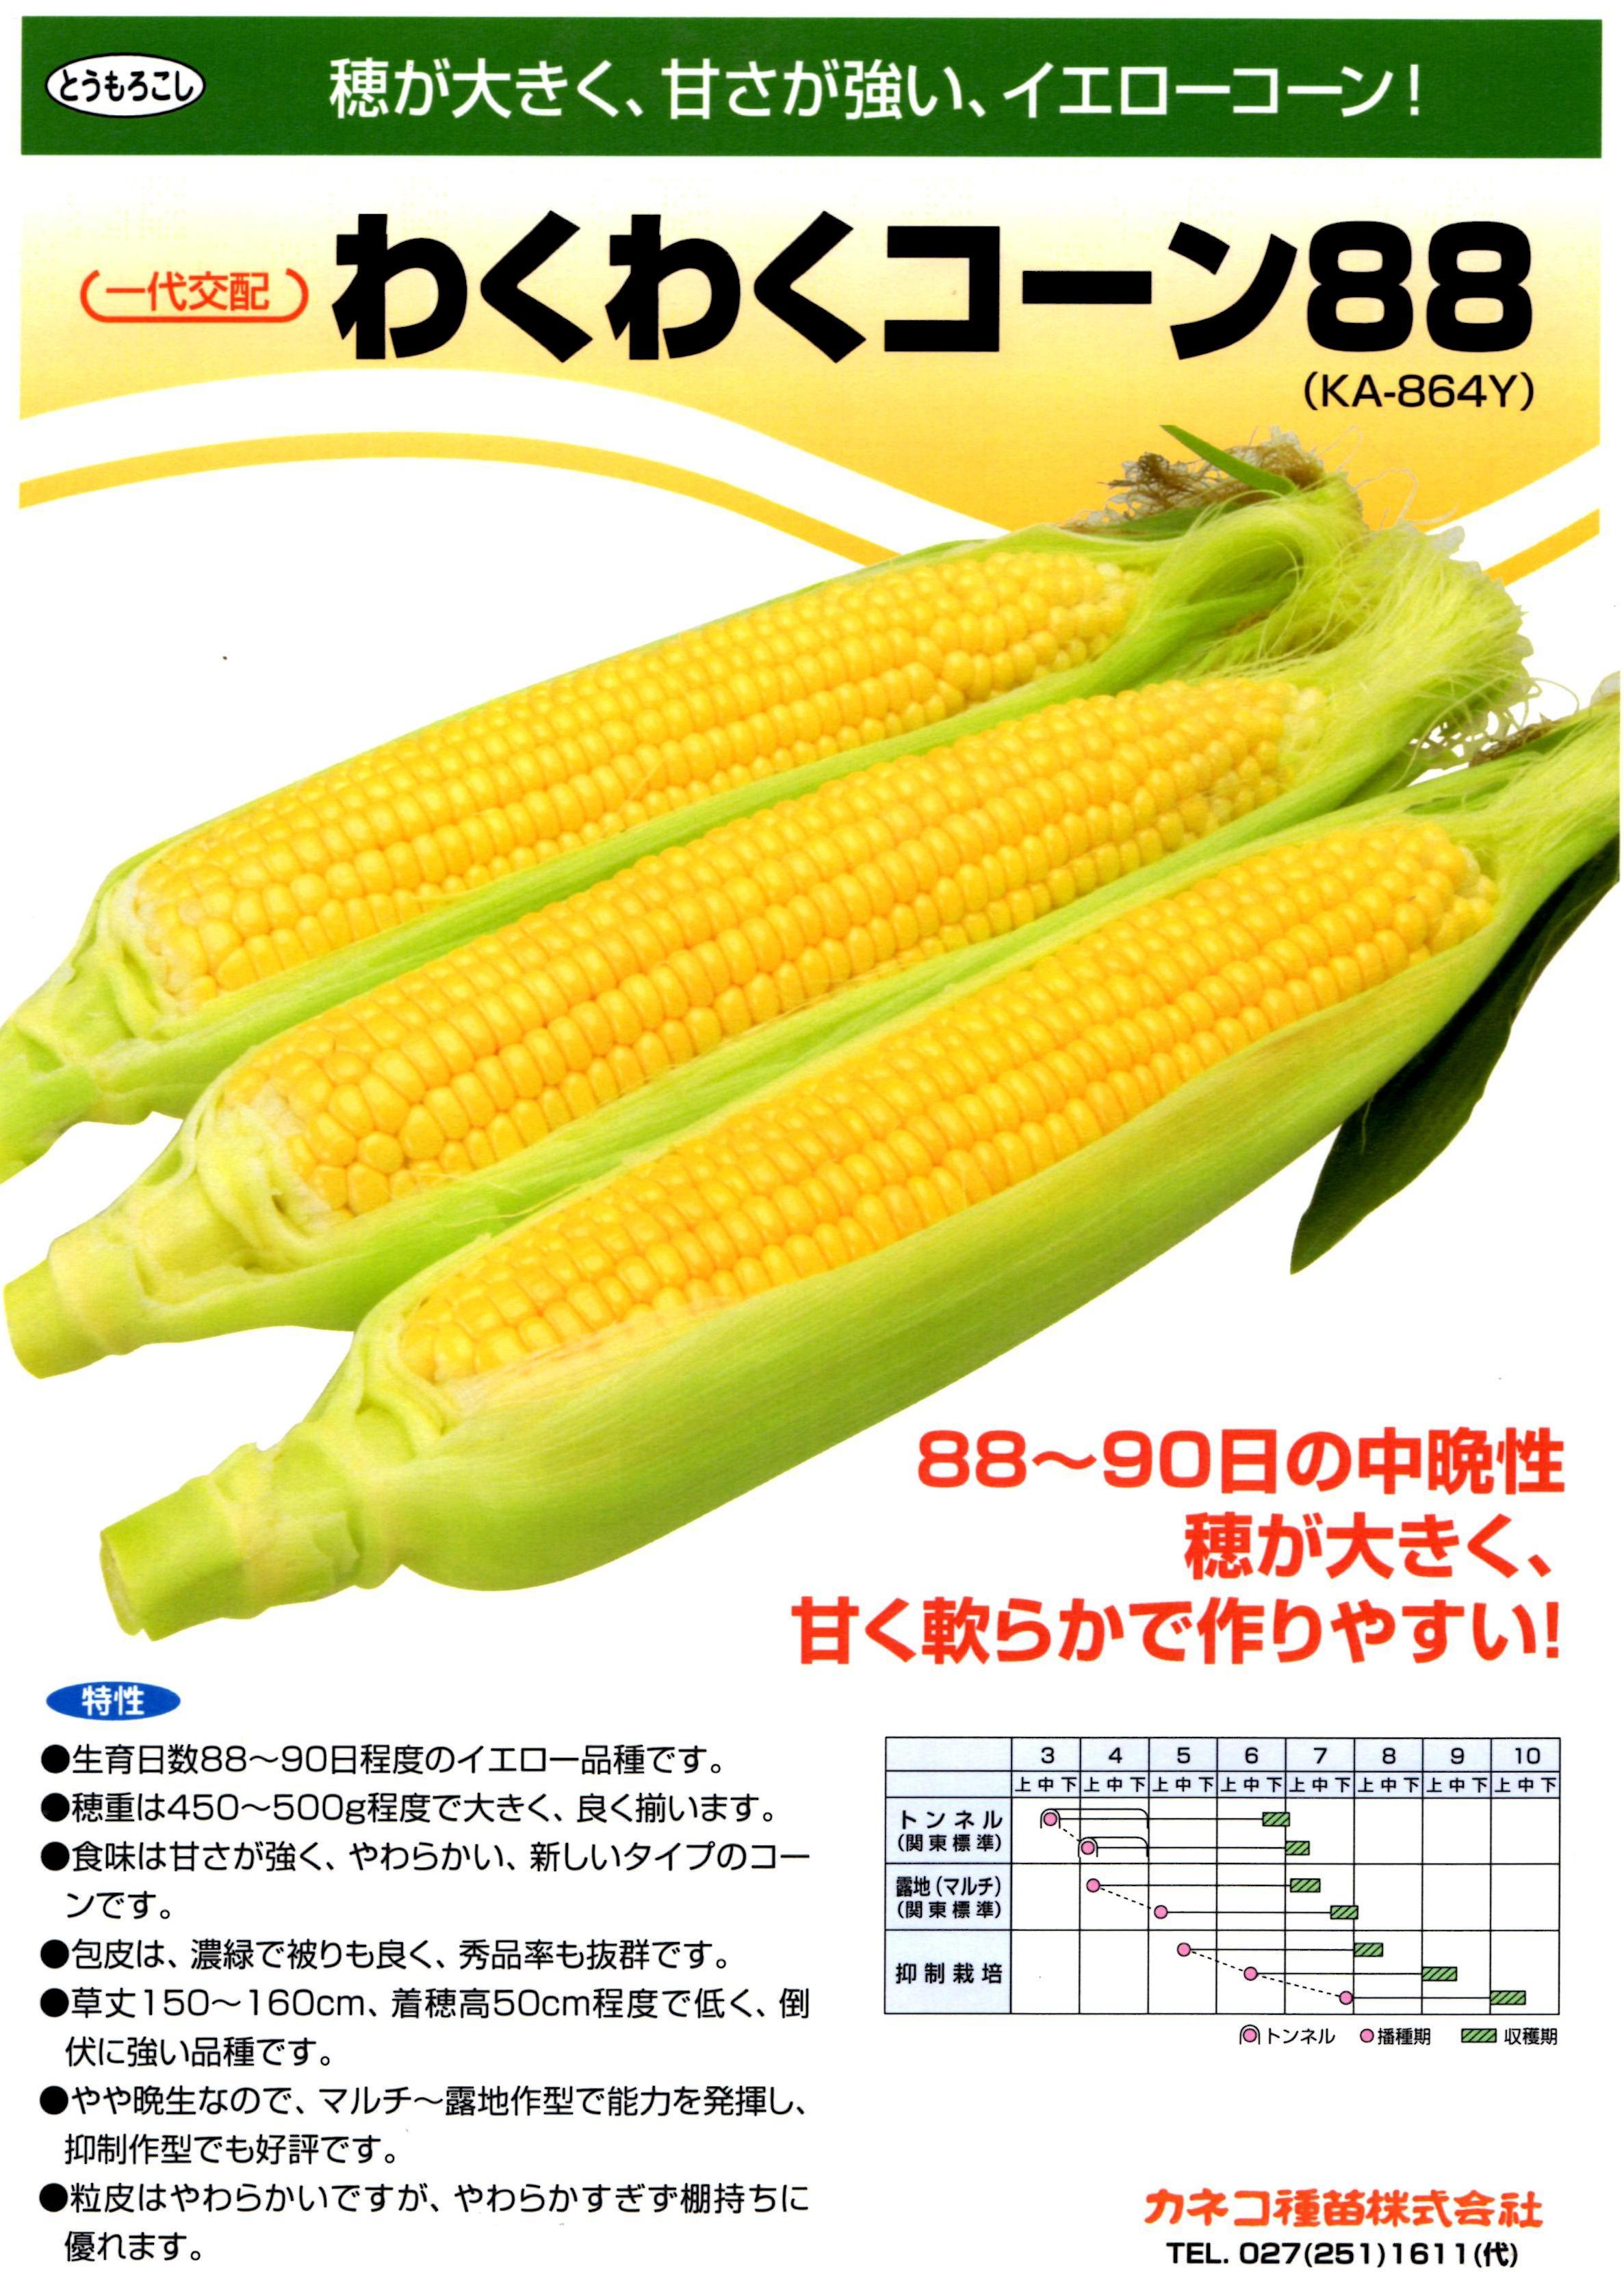 wakuwaku88-panf.jpg